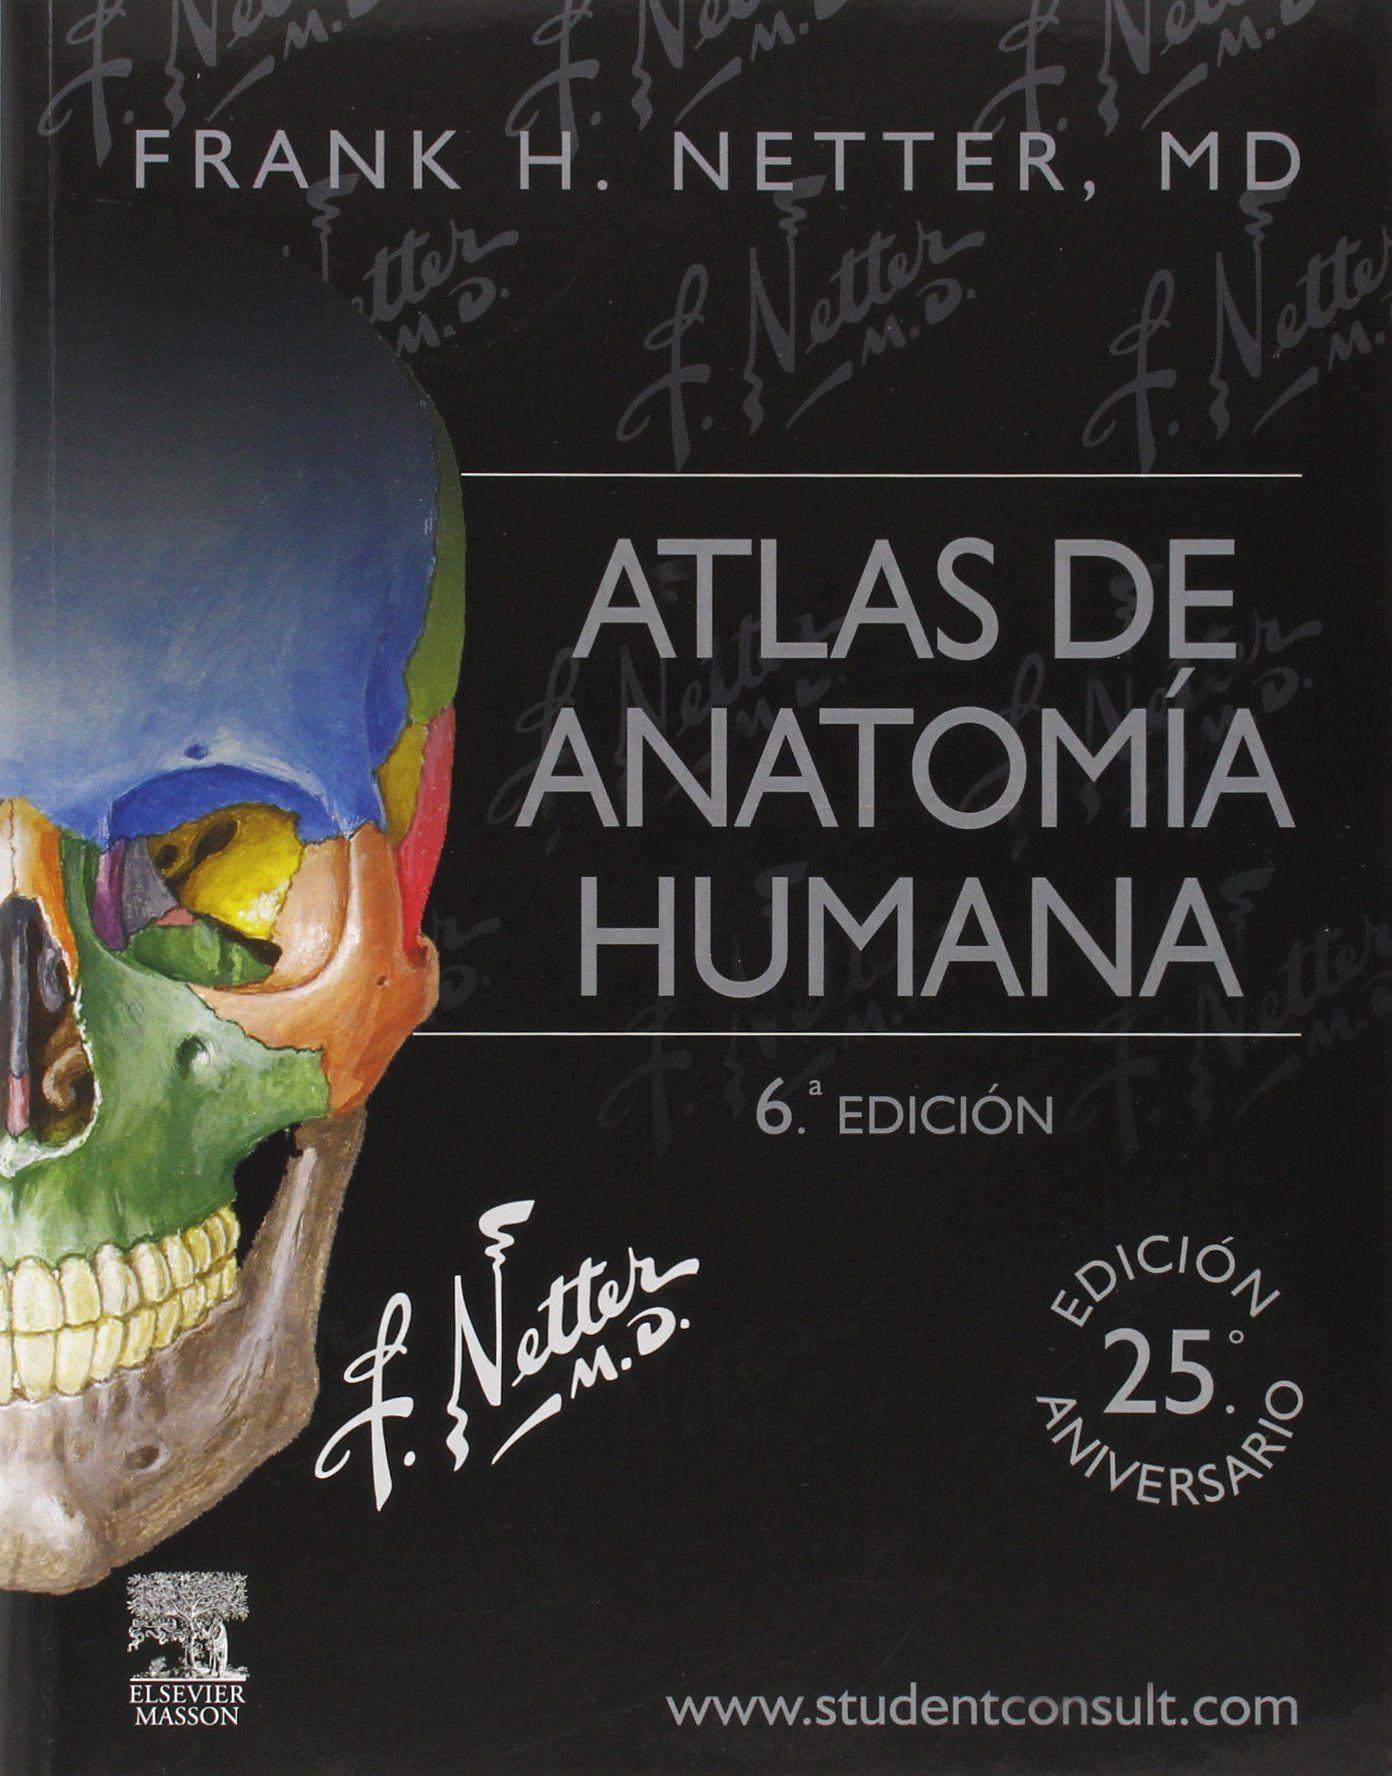 Atlas de anatomía humana / Frank H. Netter | Livro Anatomia ...